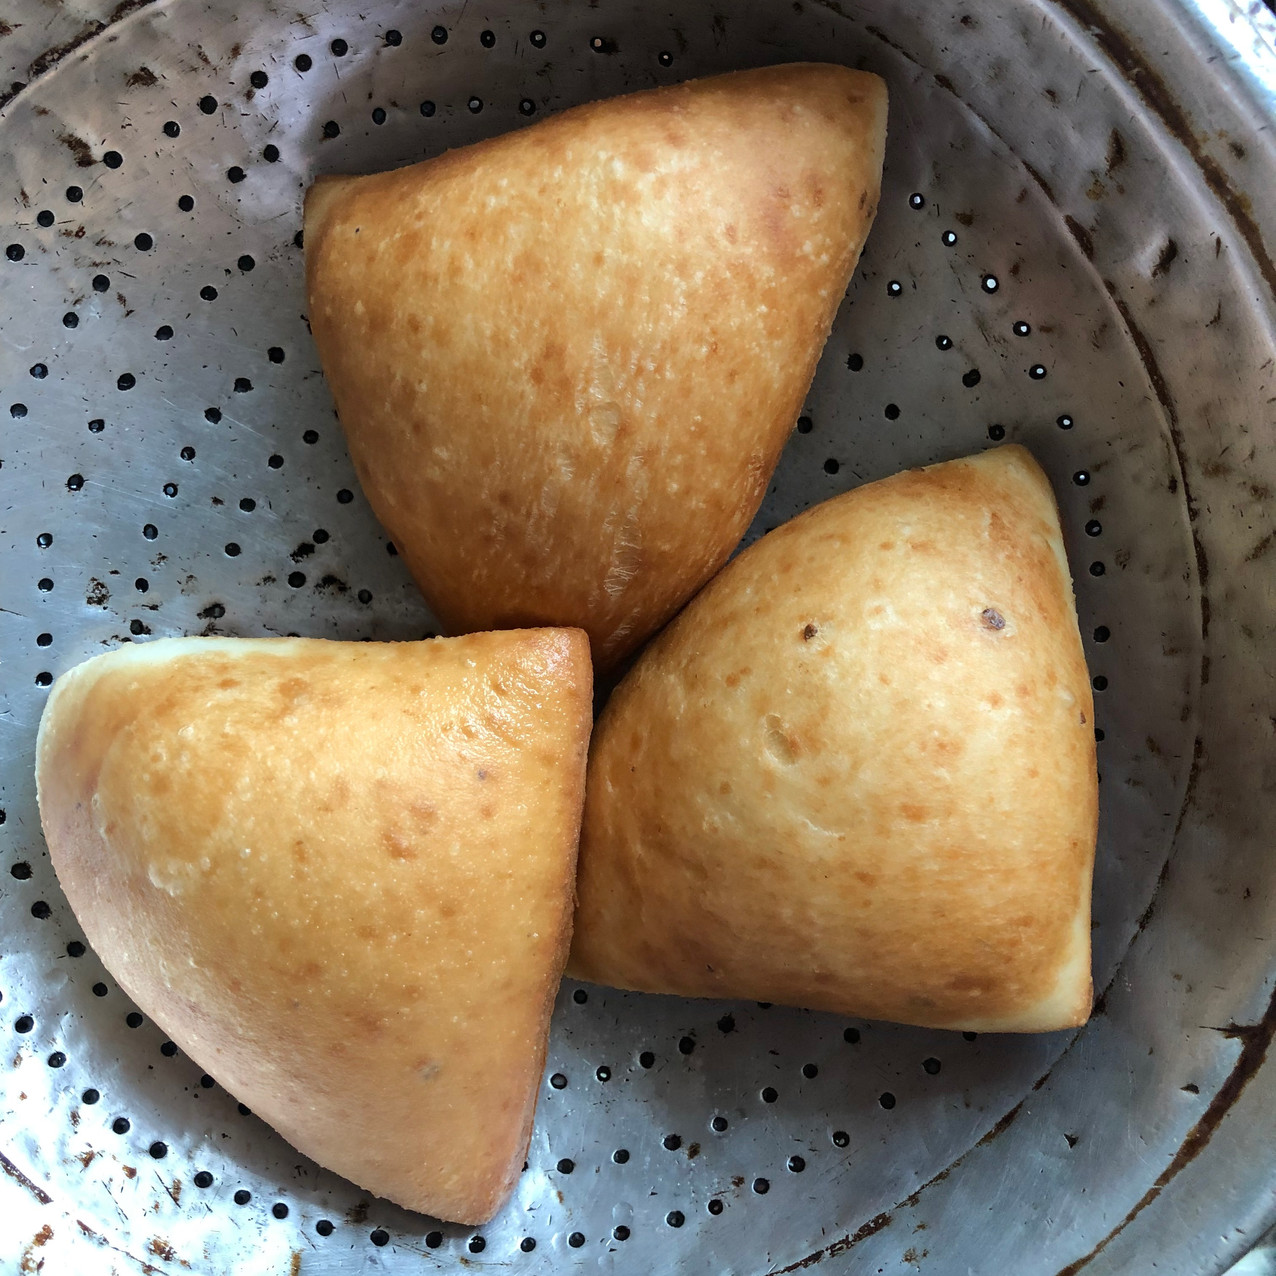 mandazi-mahamri-just-fried-fresh-east-af